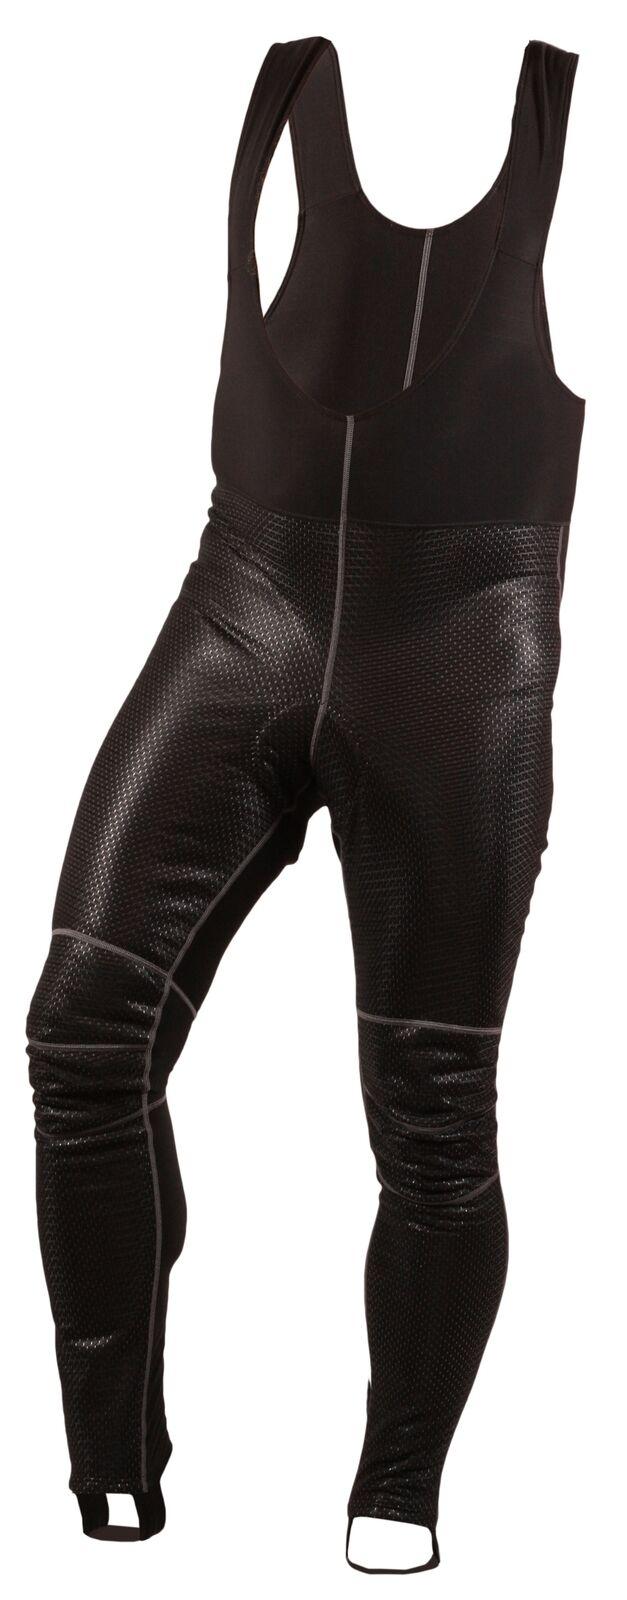 Mens thermal warm winter cycling windproof long bib tights bike padded pants